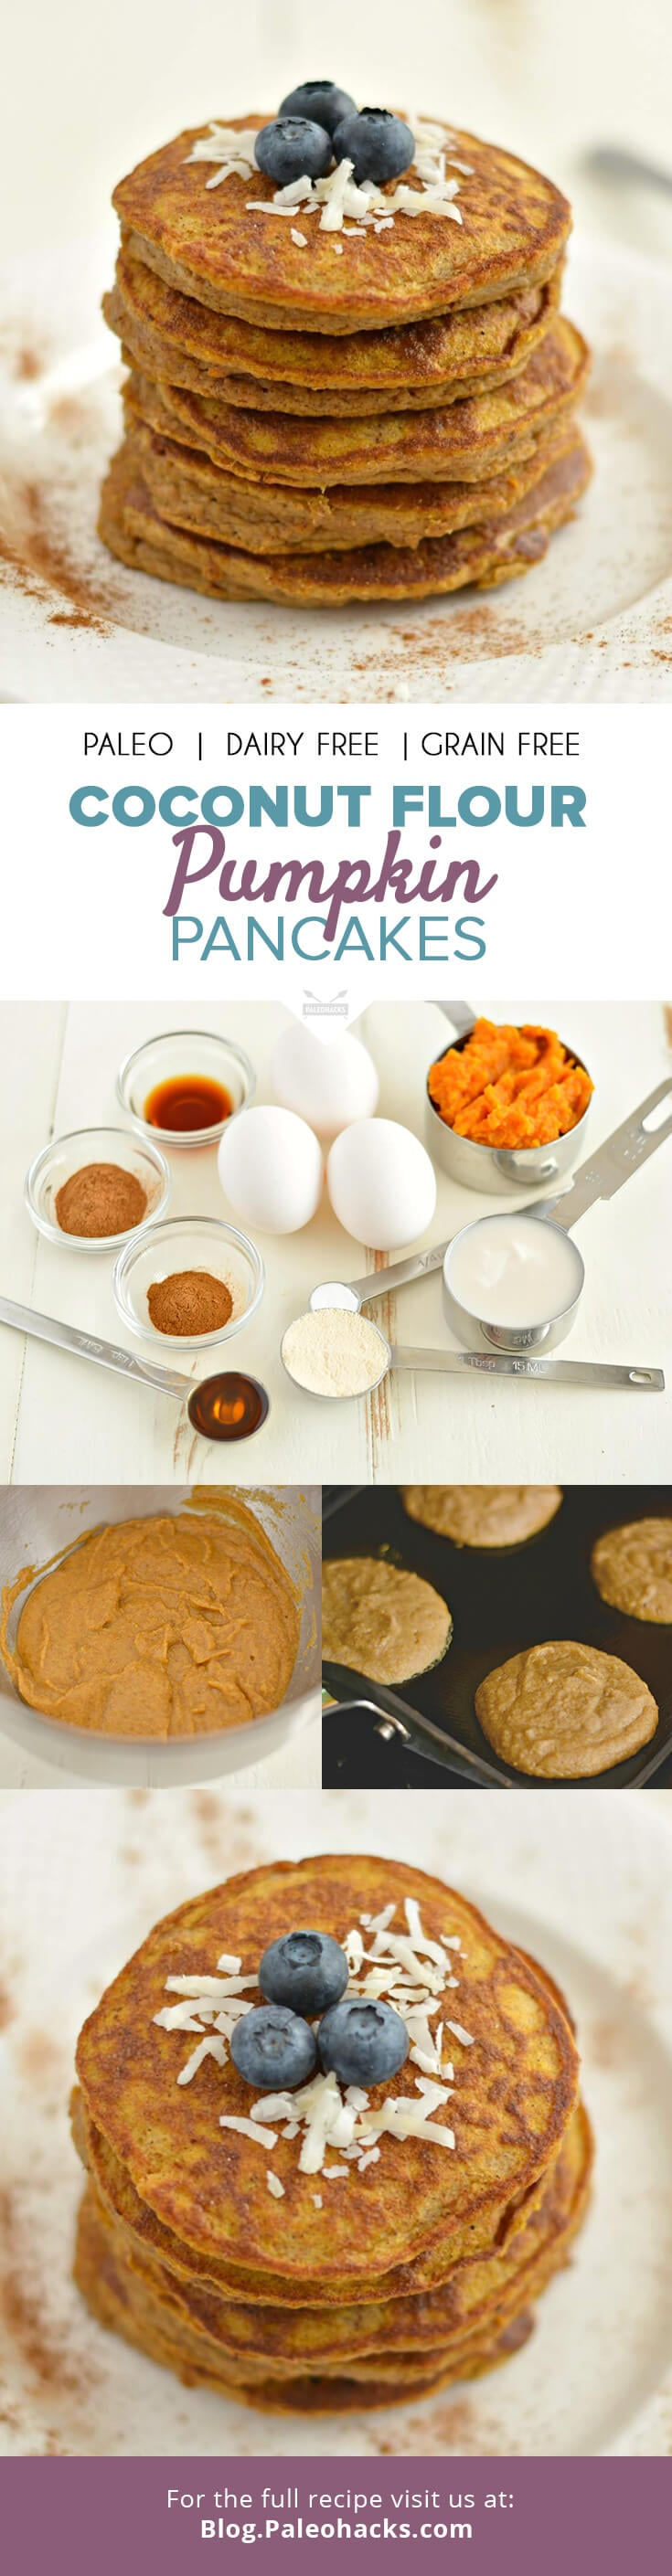 Paleo Pumpkin Pancakes Recipe | POPSUGAR Fitness